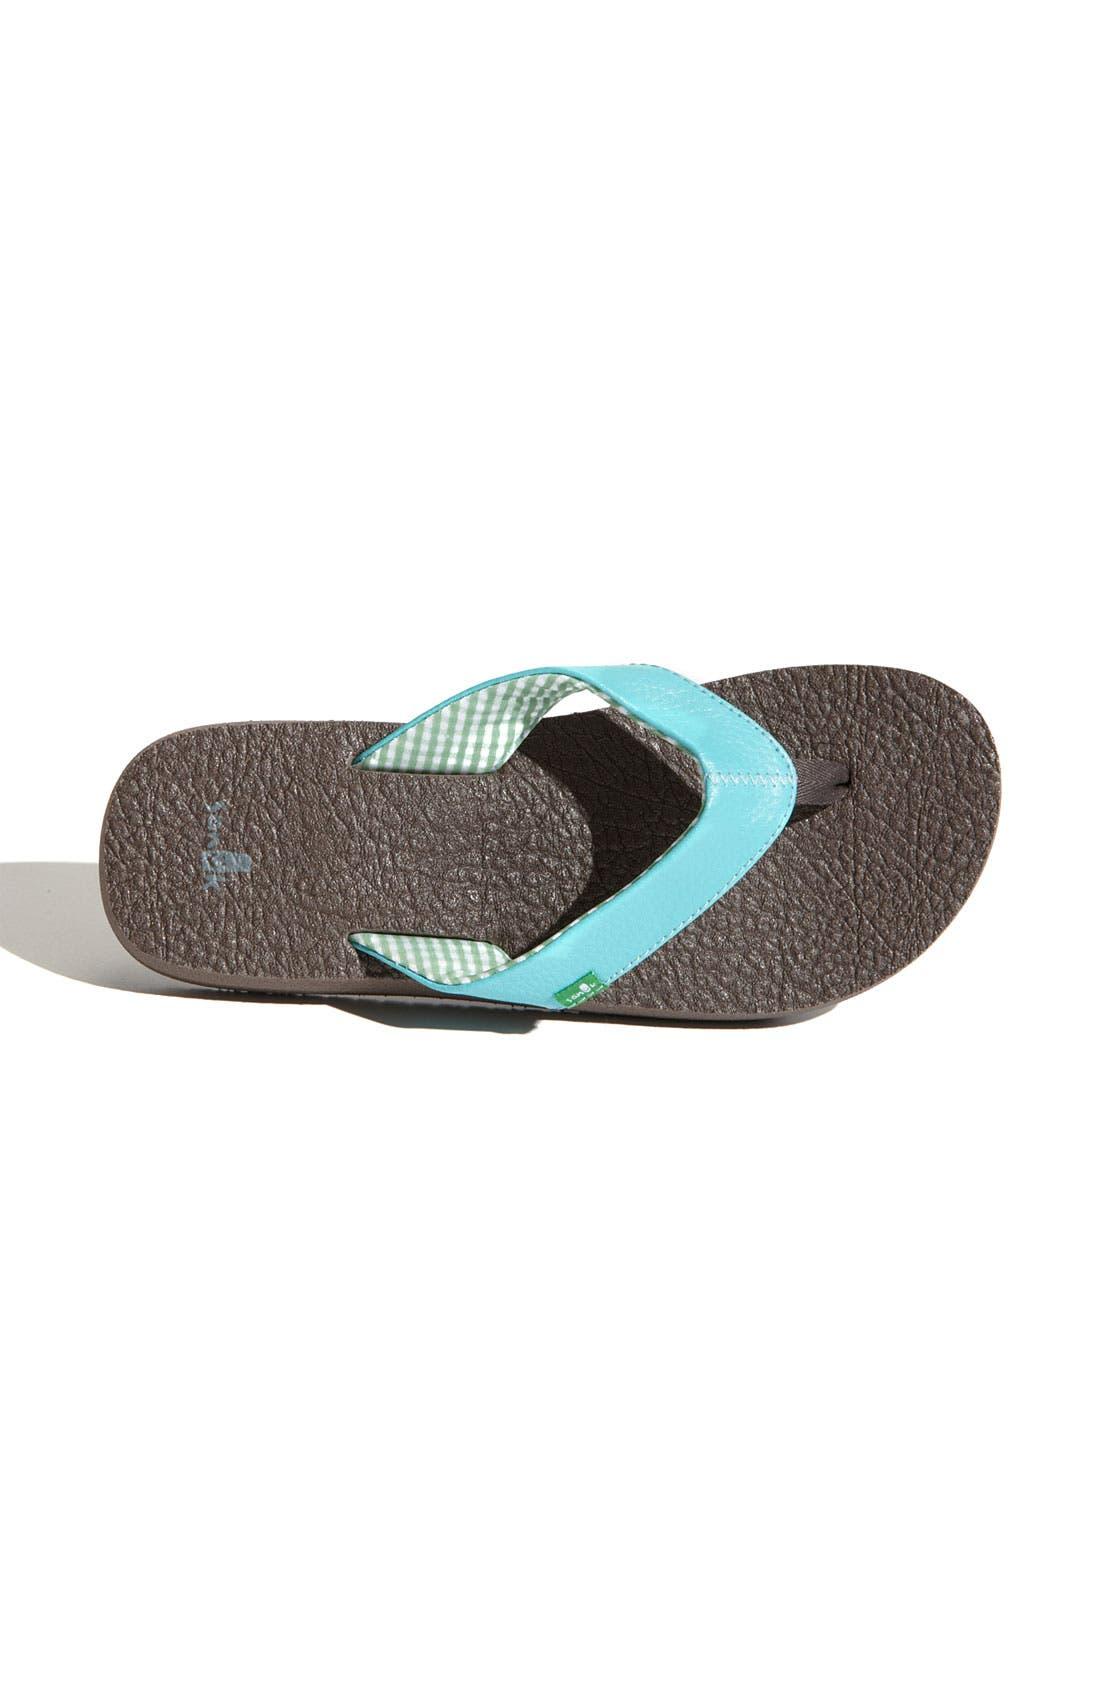 Alternate Image 3  - Sanuk 'Yoga Mat' Flip Flop (Women)